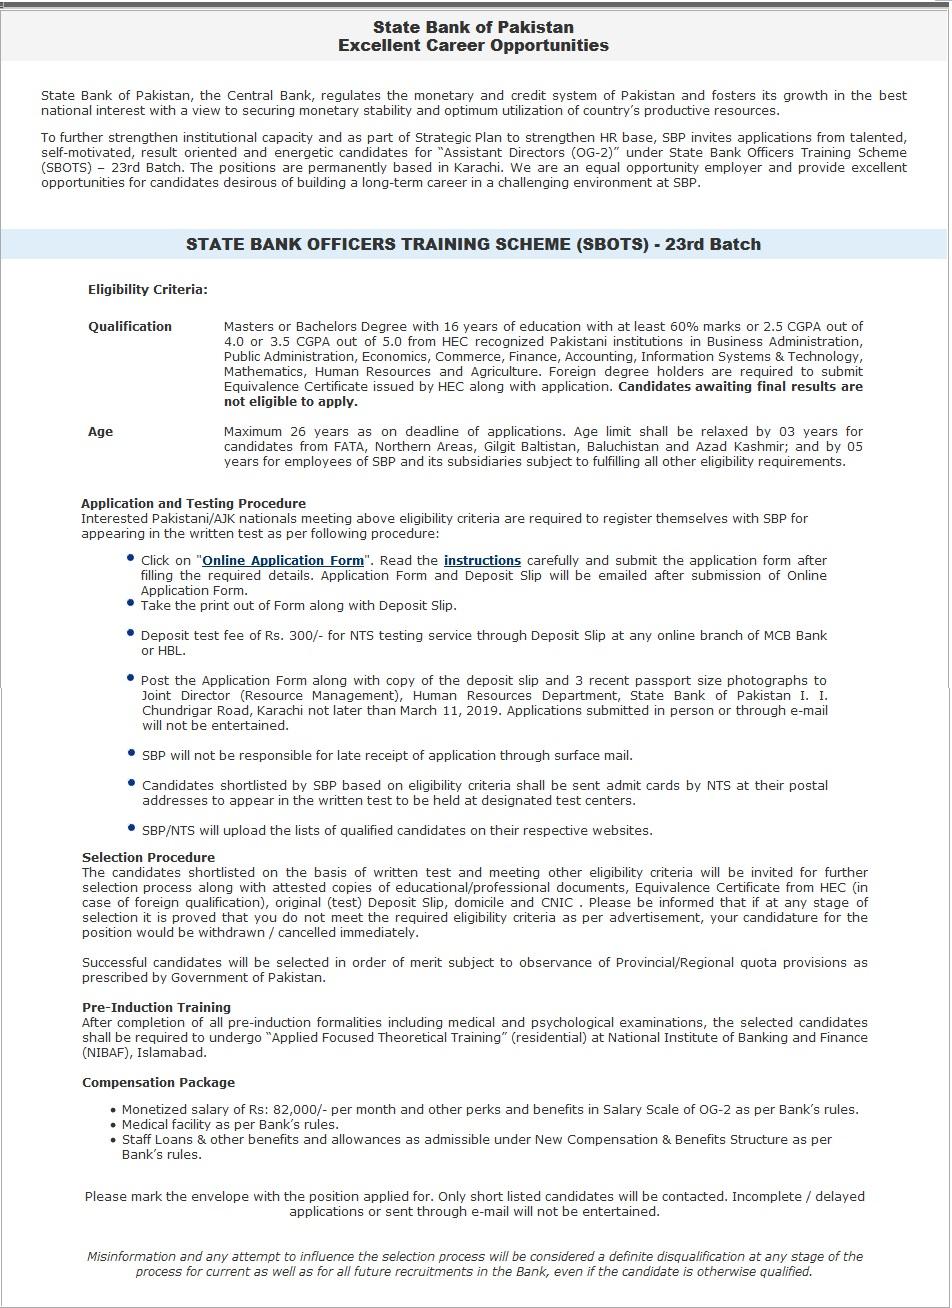 State Bank Pakistan OG-2 Jobs 2019 NTS Apply Online Roll No Slip